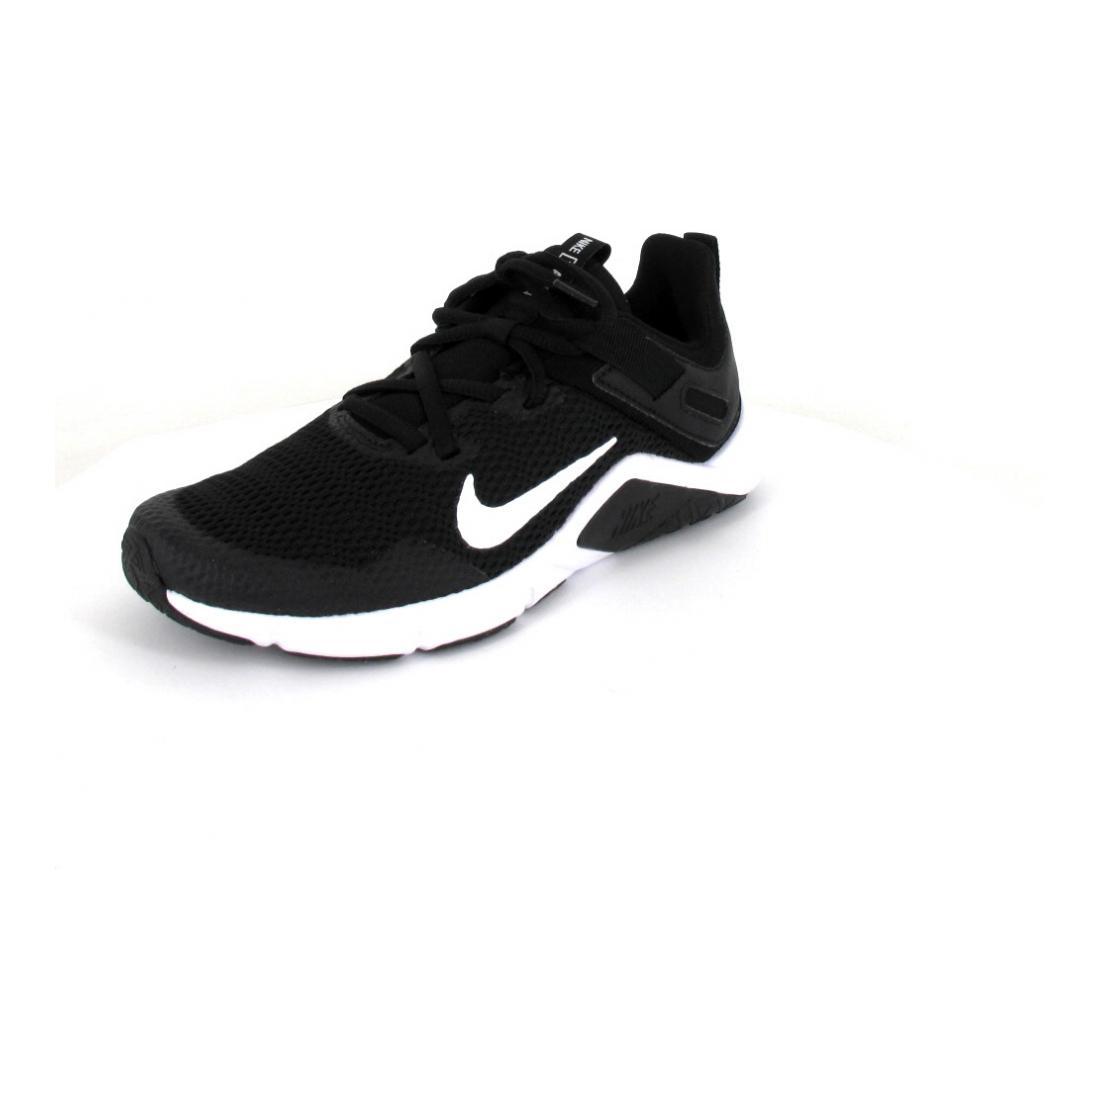 Nike Sportschuh WMNS Legend Essential